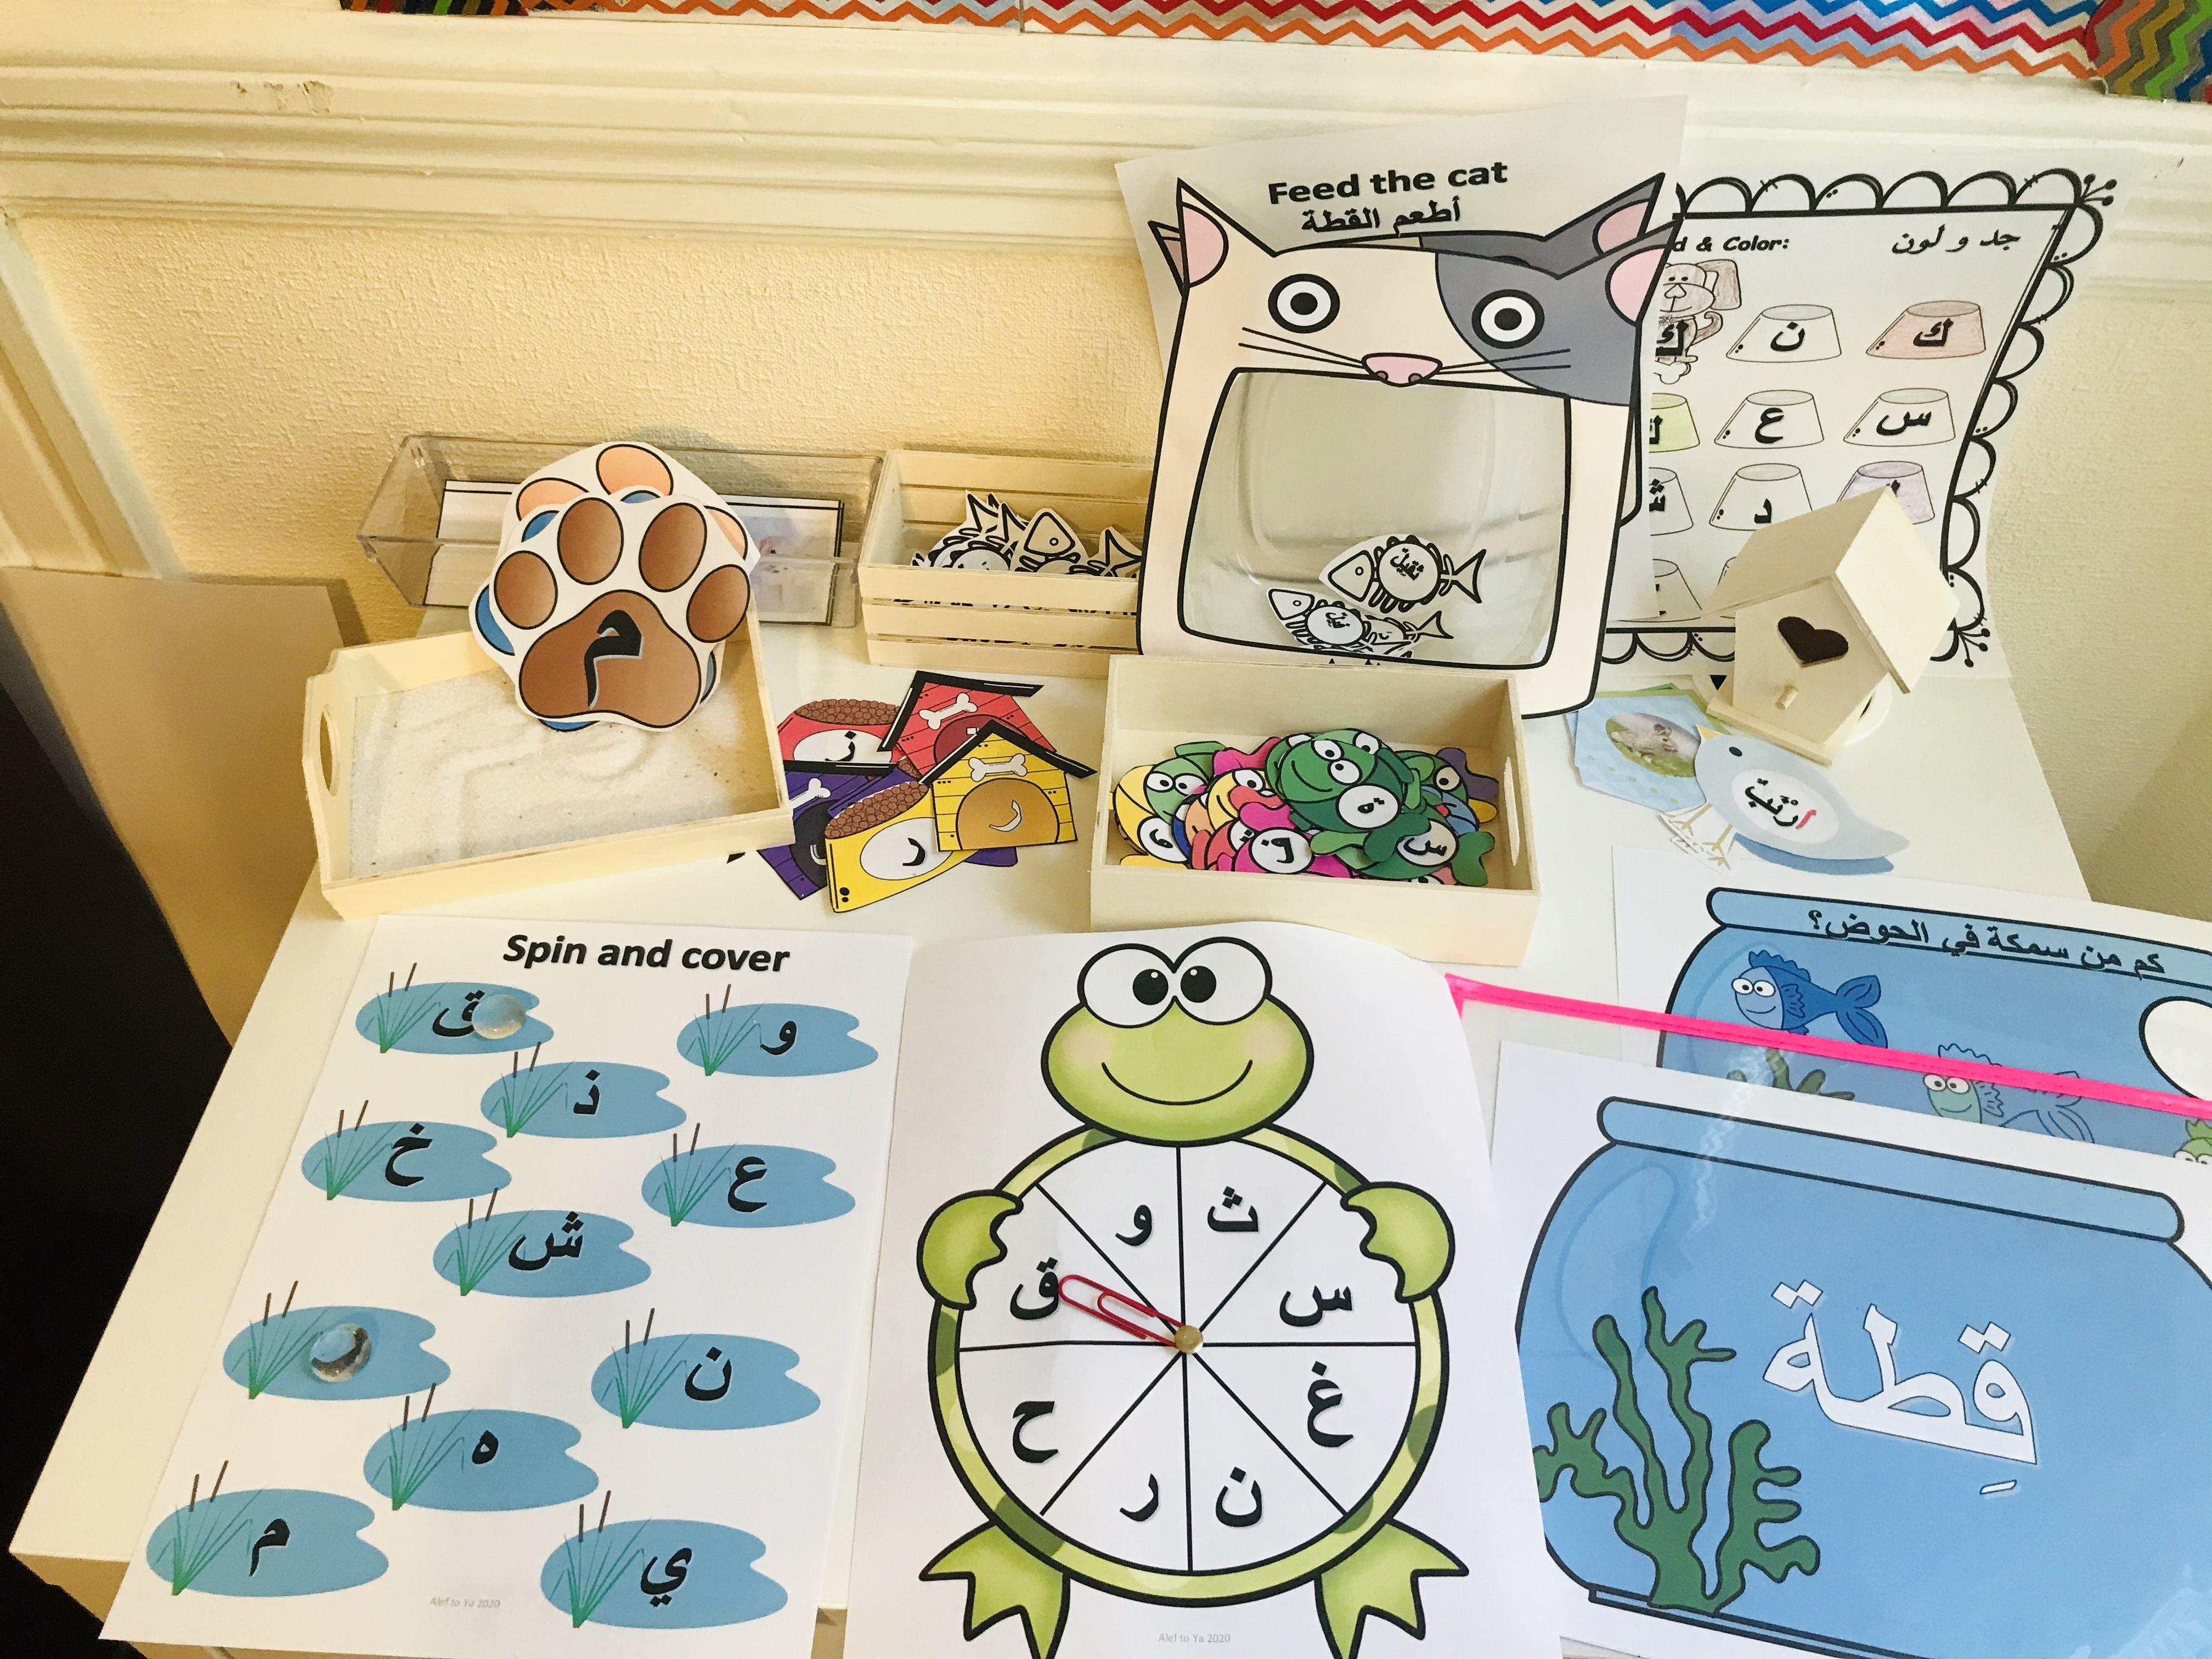 Arabic Pets Unit الحيوانات الأليفة Alphabet Cards Esl Teachers Teaching Resources